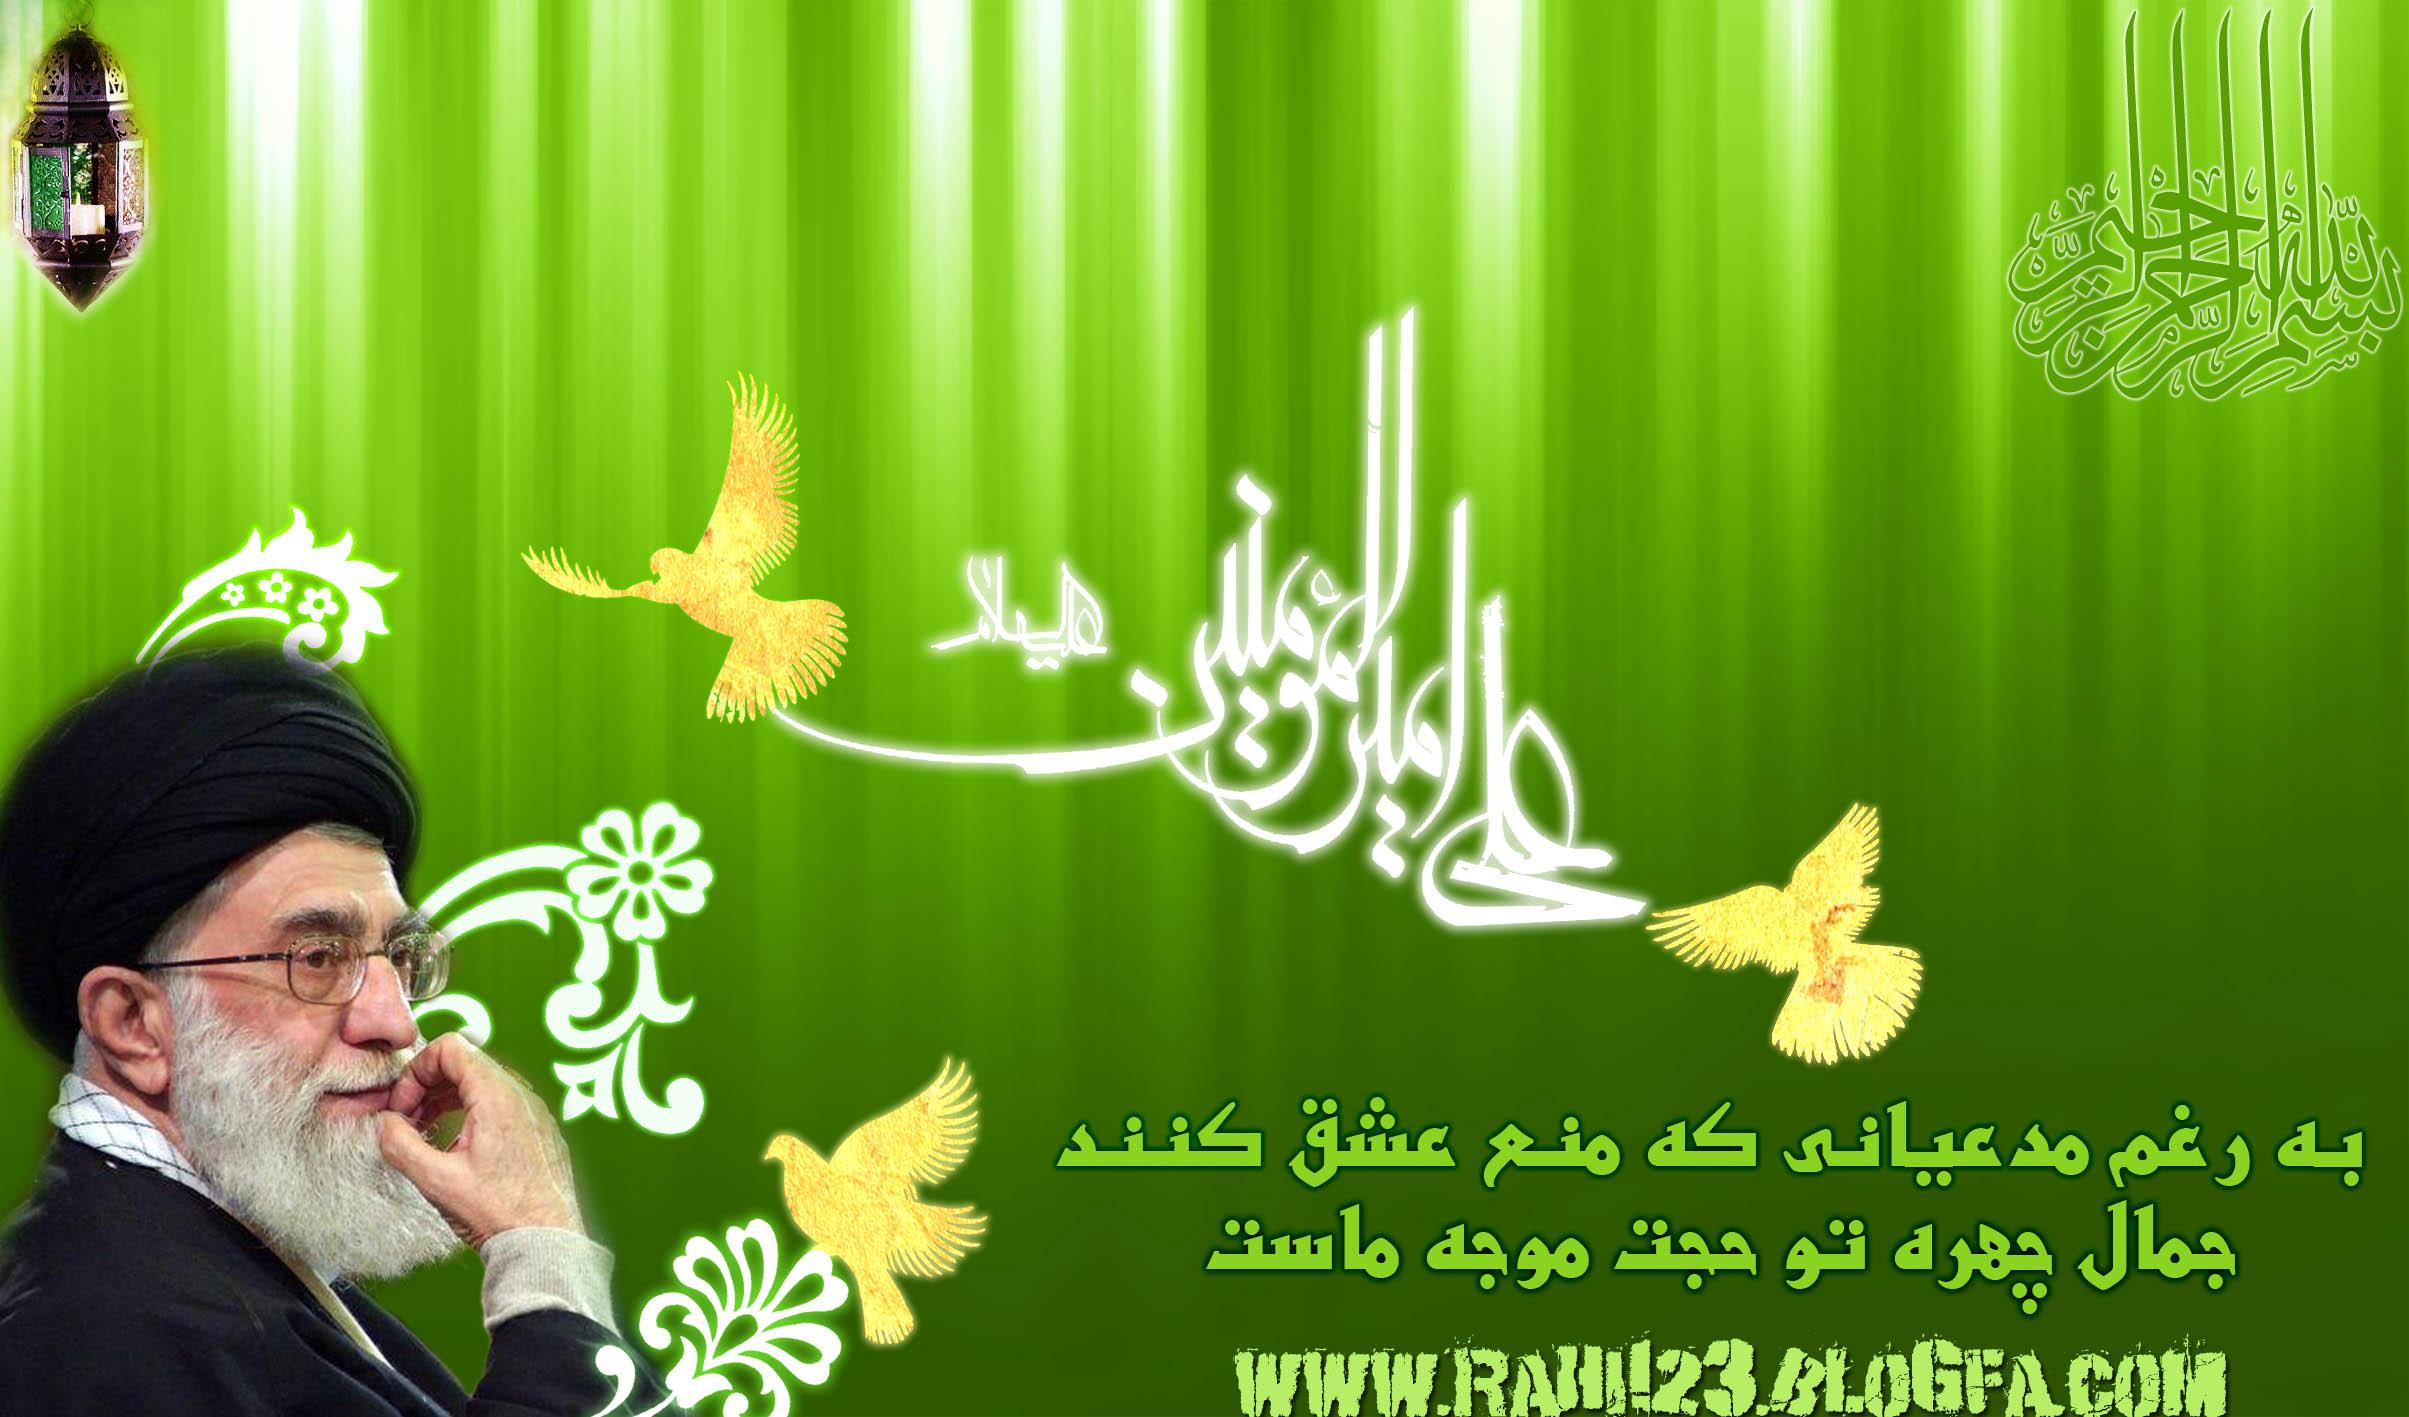 رهبر ايران ، رهبر جمهوري اسلامي ايران ، iran leader khamenei